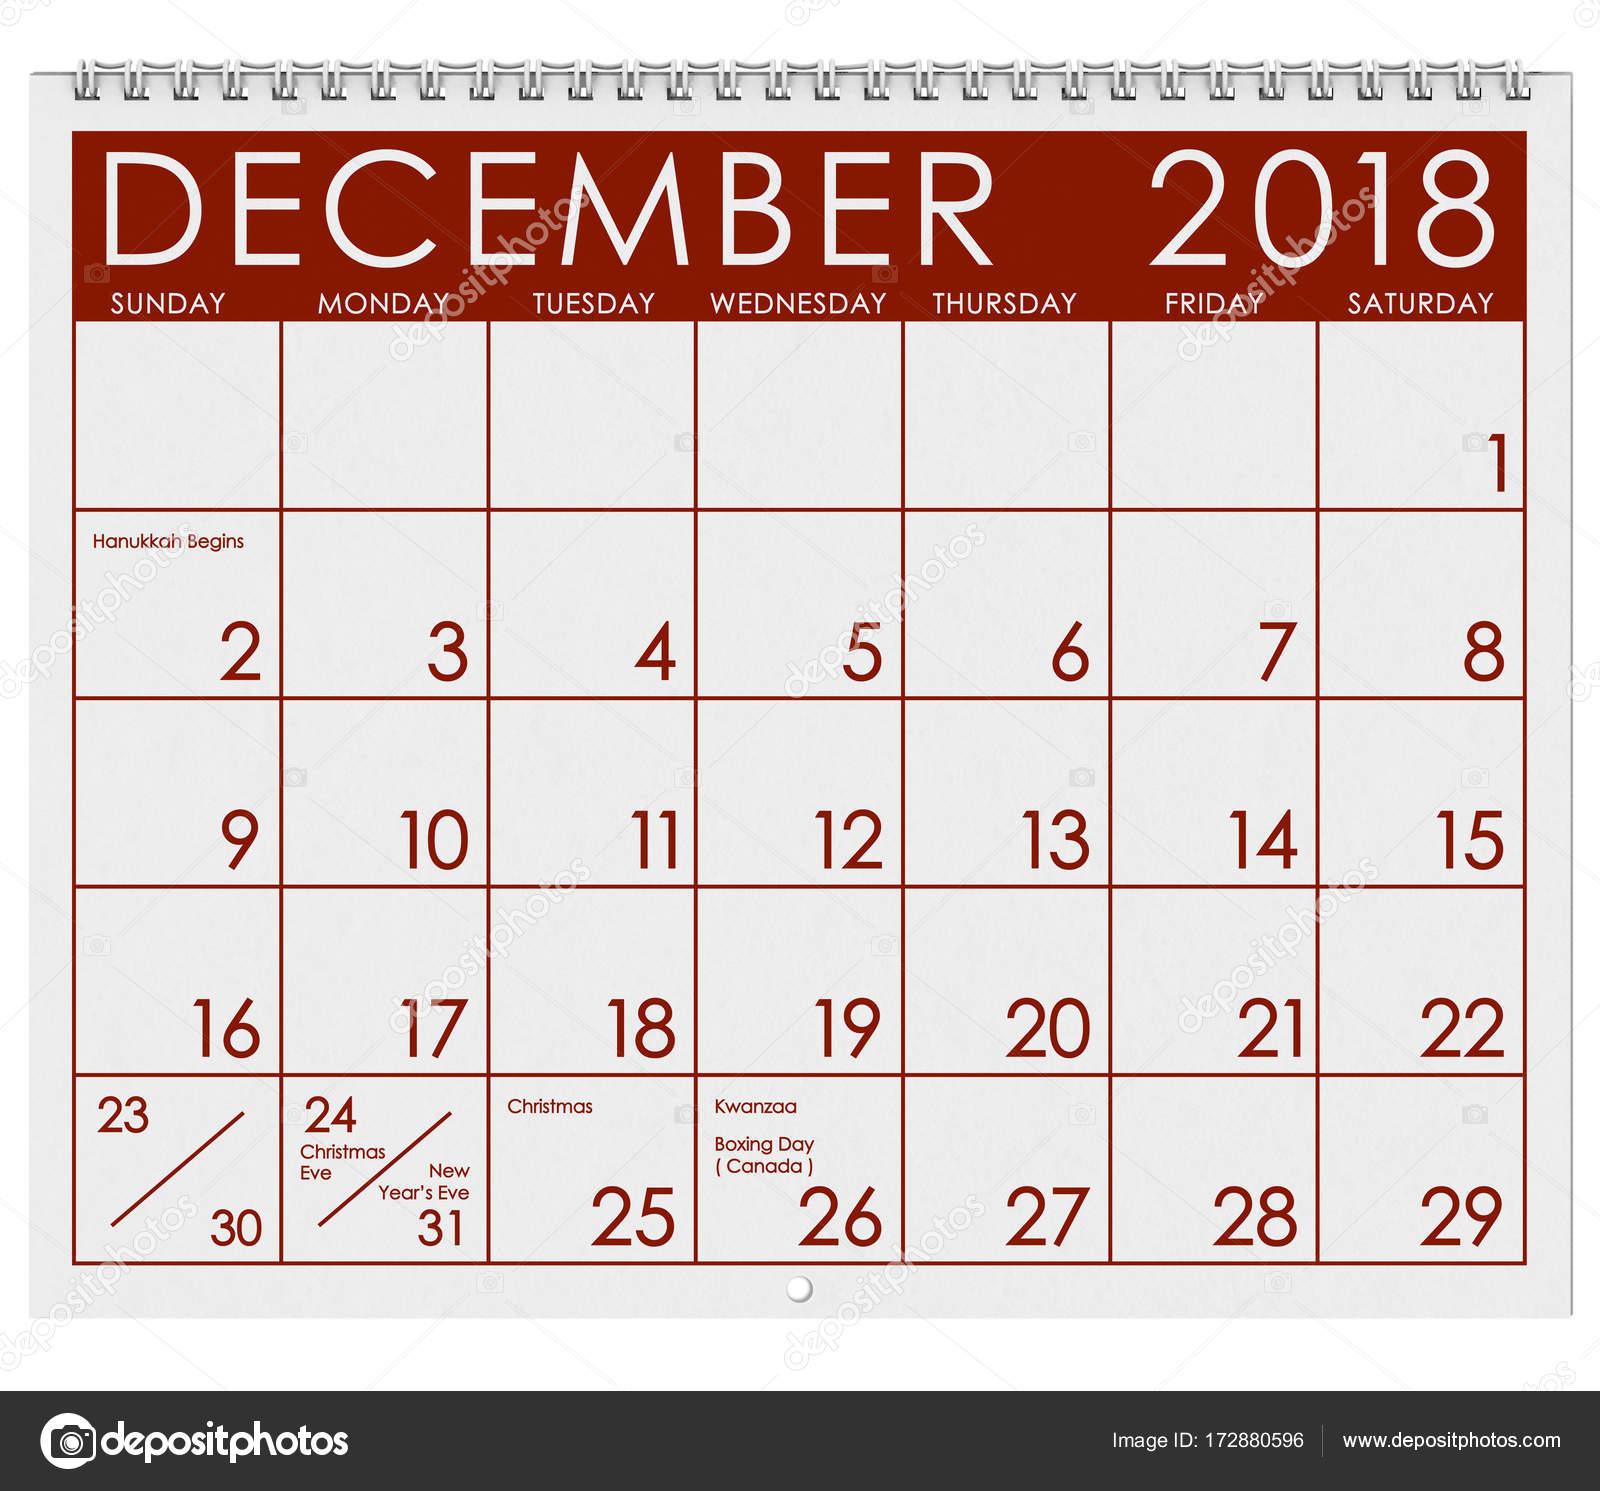 weihnachten 2018 kalender 2018 Kalender: Monat Dezember mit Weihnachten — Stockfoto  weihnachten 2018 kalender